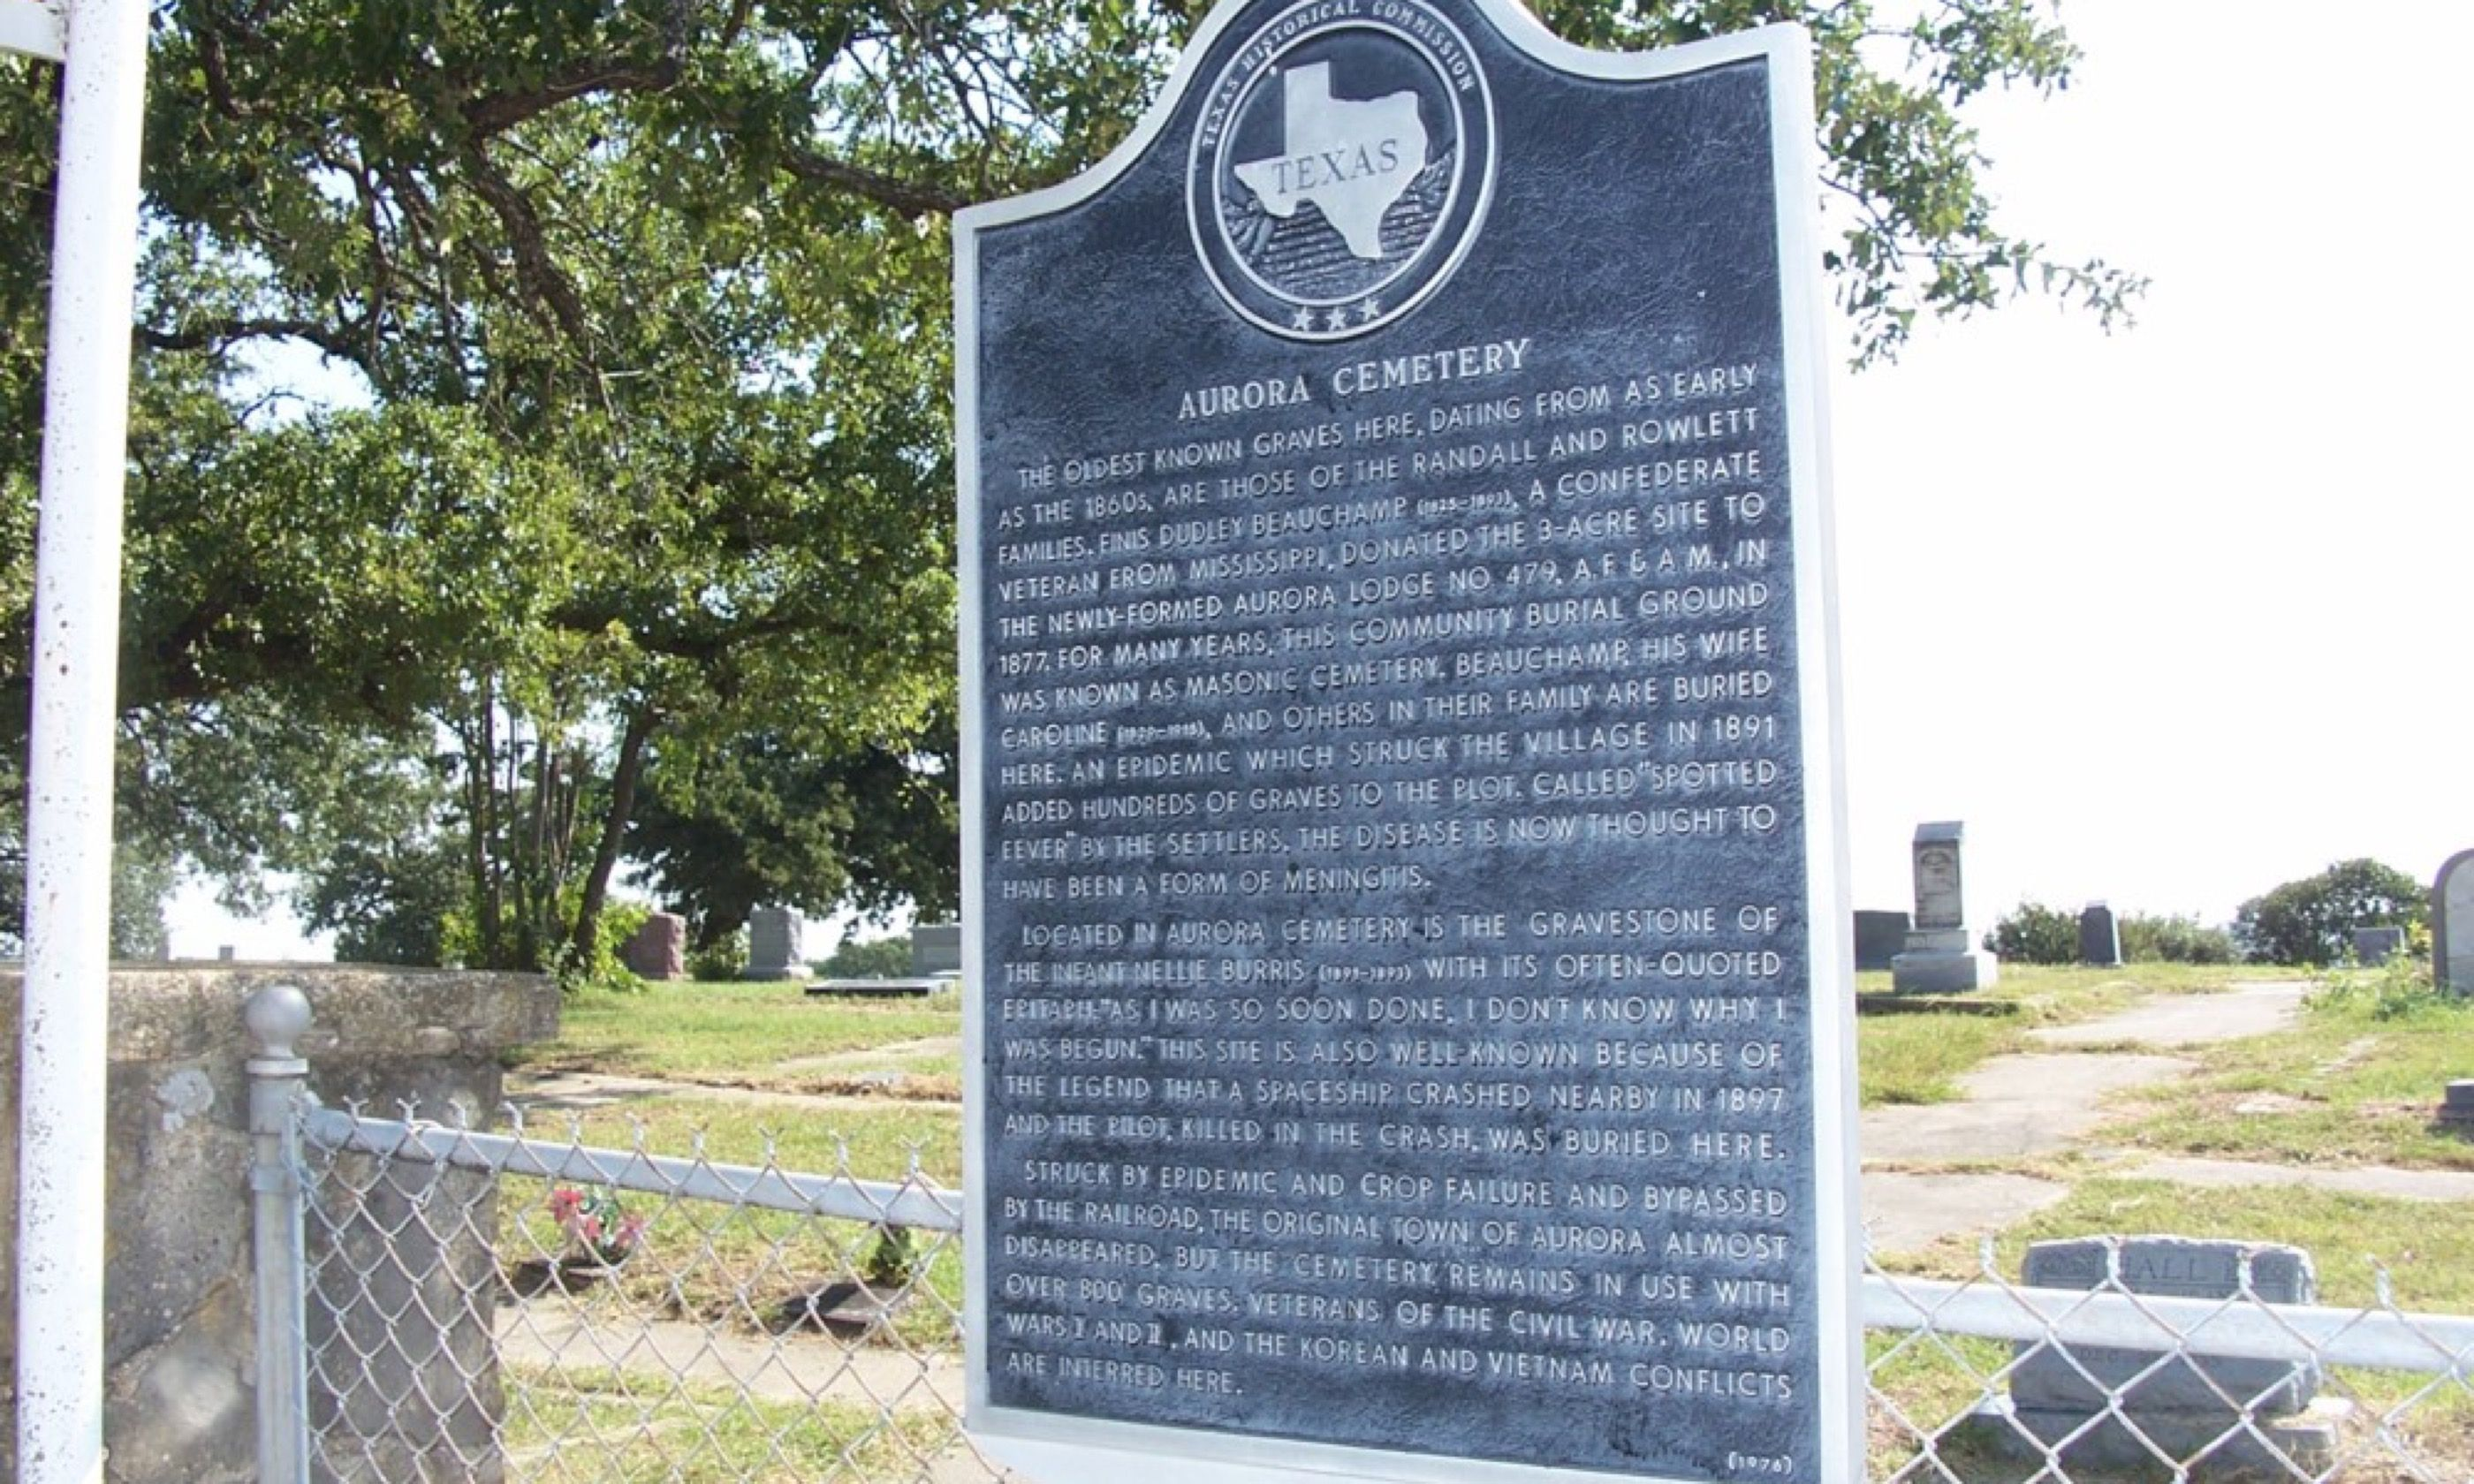 Historical Marker for burial site of UFO pilot (Creative Commons: Jcornelius)